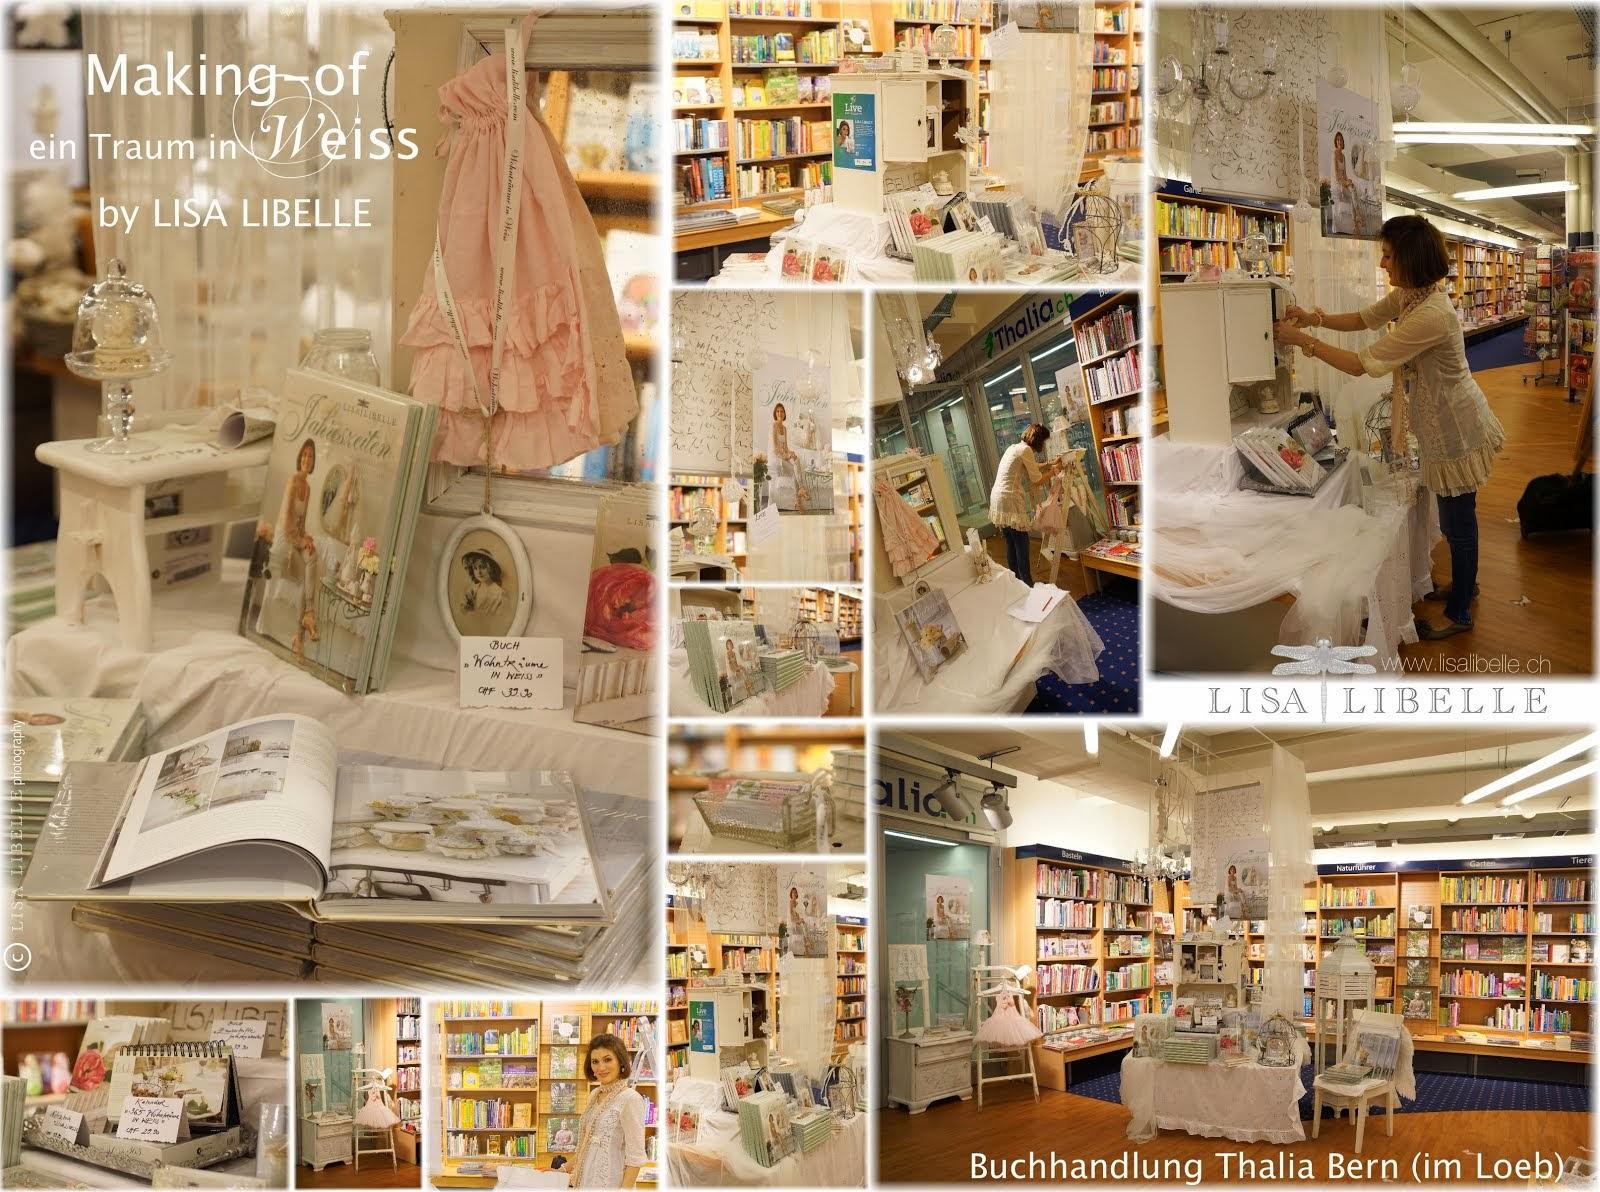 Gast in der Buchhandlung Thalia Bern